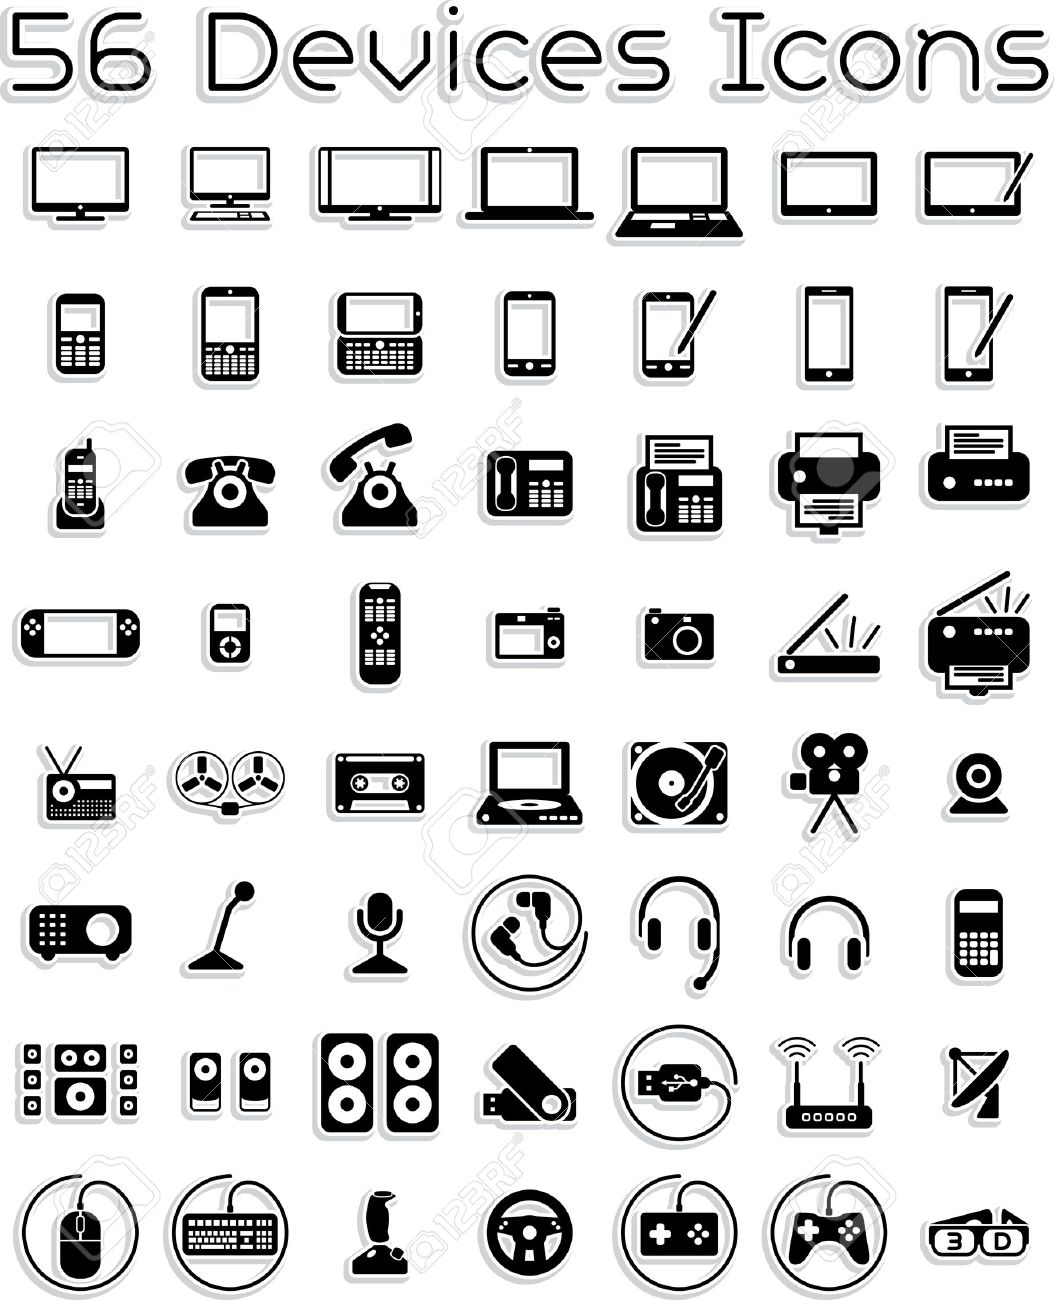 Elektronische Geräte - Vector Icons Set Lizenzfrei Nutzbare ...